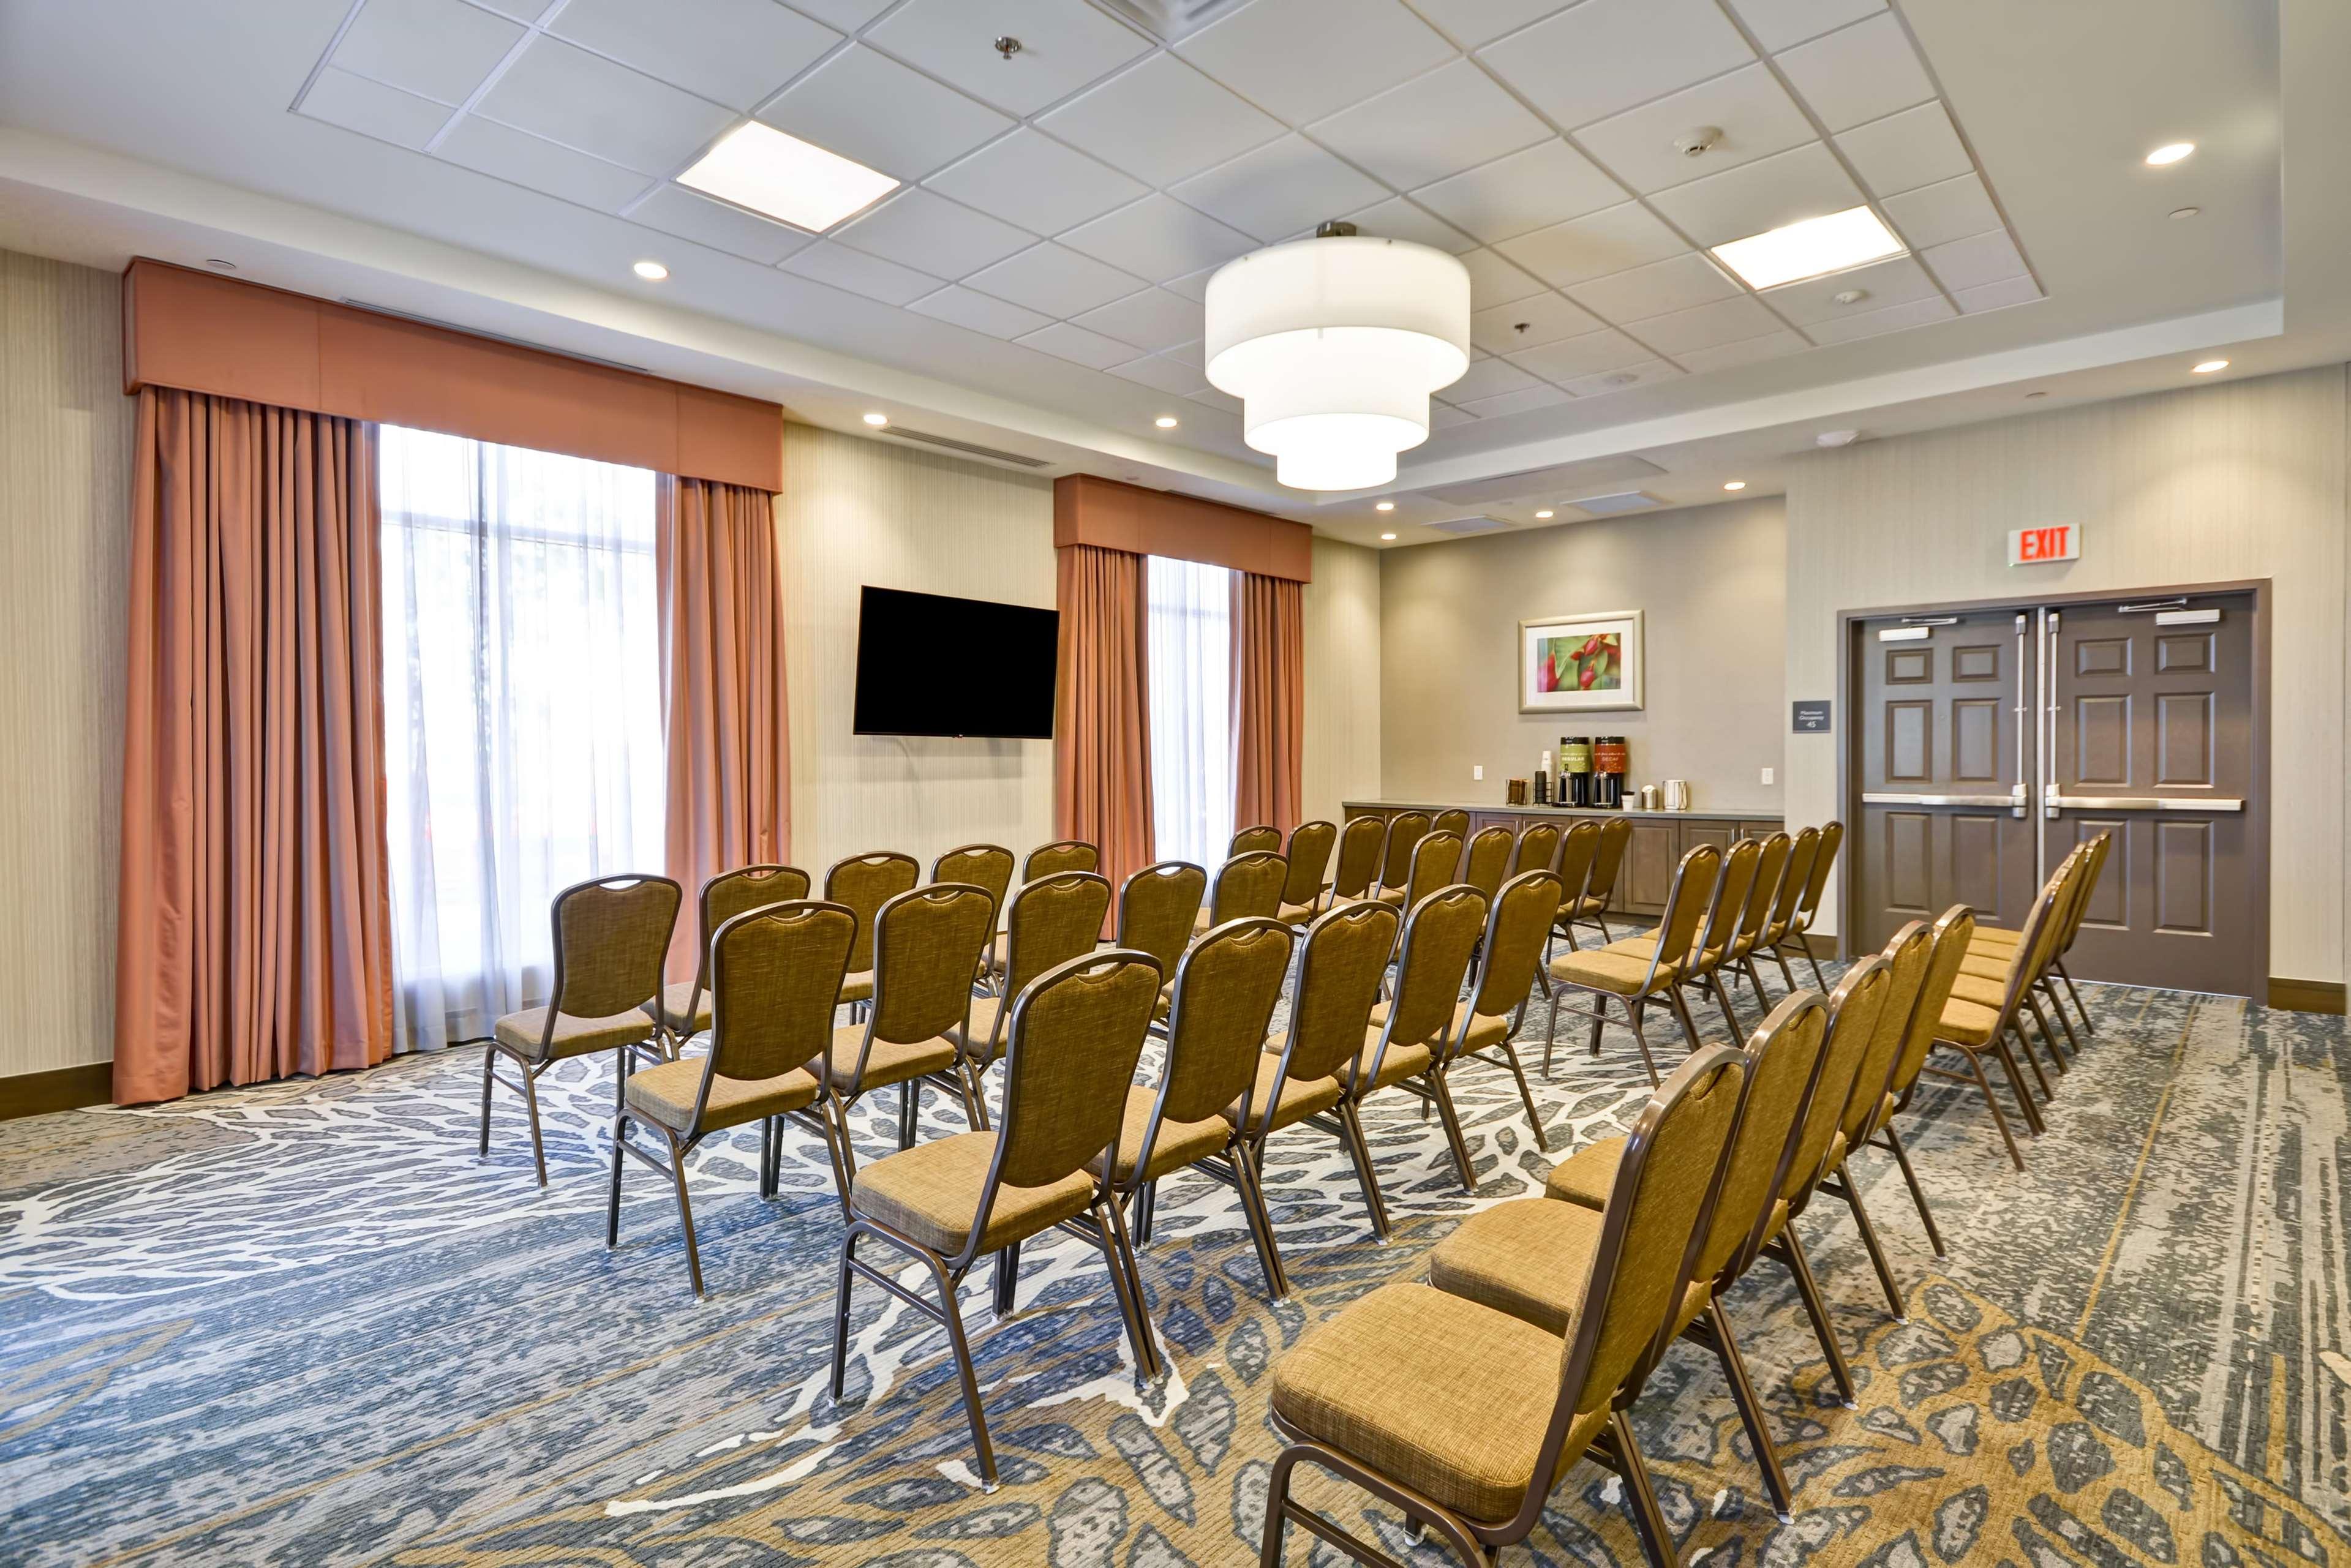 Hilton Garden Inn Phoenix/Tempe ASU Area image 24